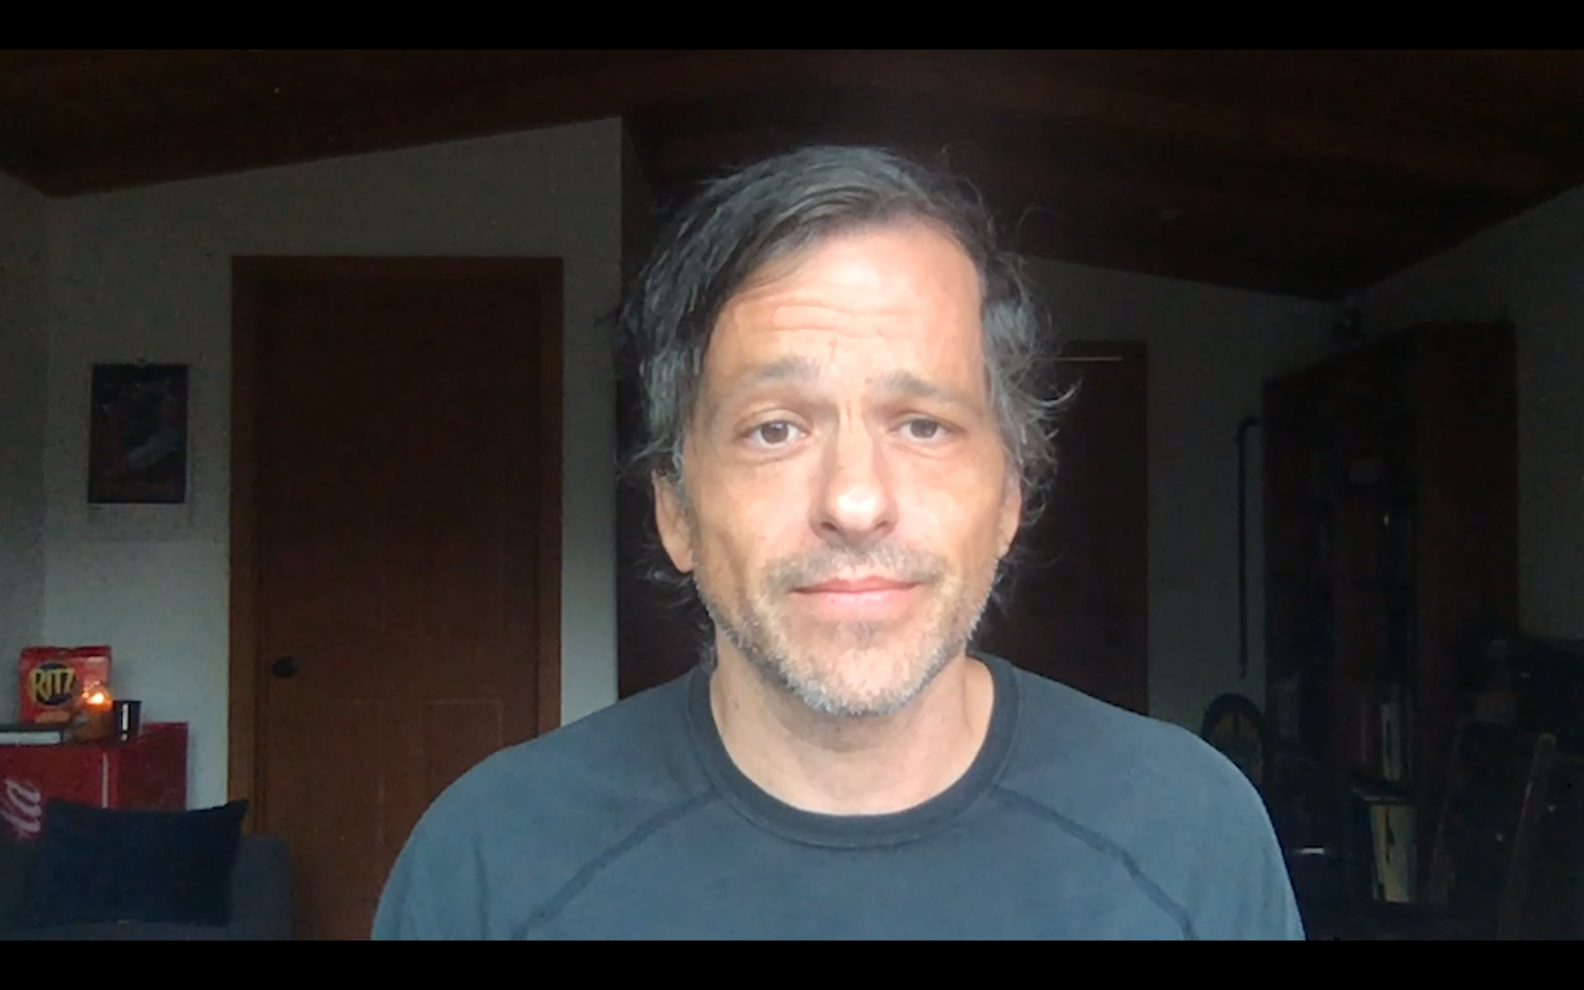 Aaron Guzikowski at the Raised by Wolves Virtual Premiere